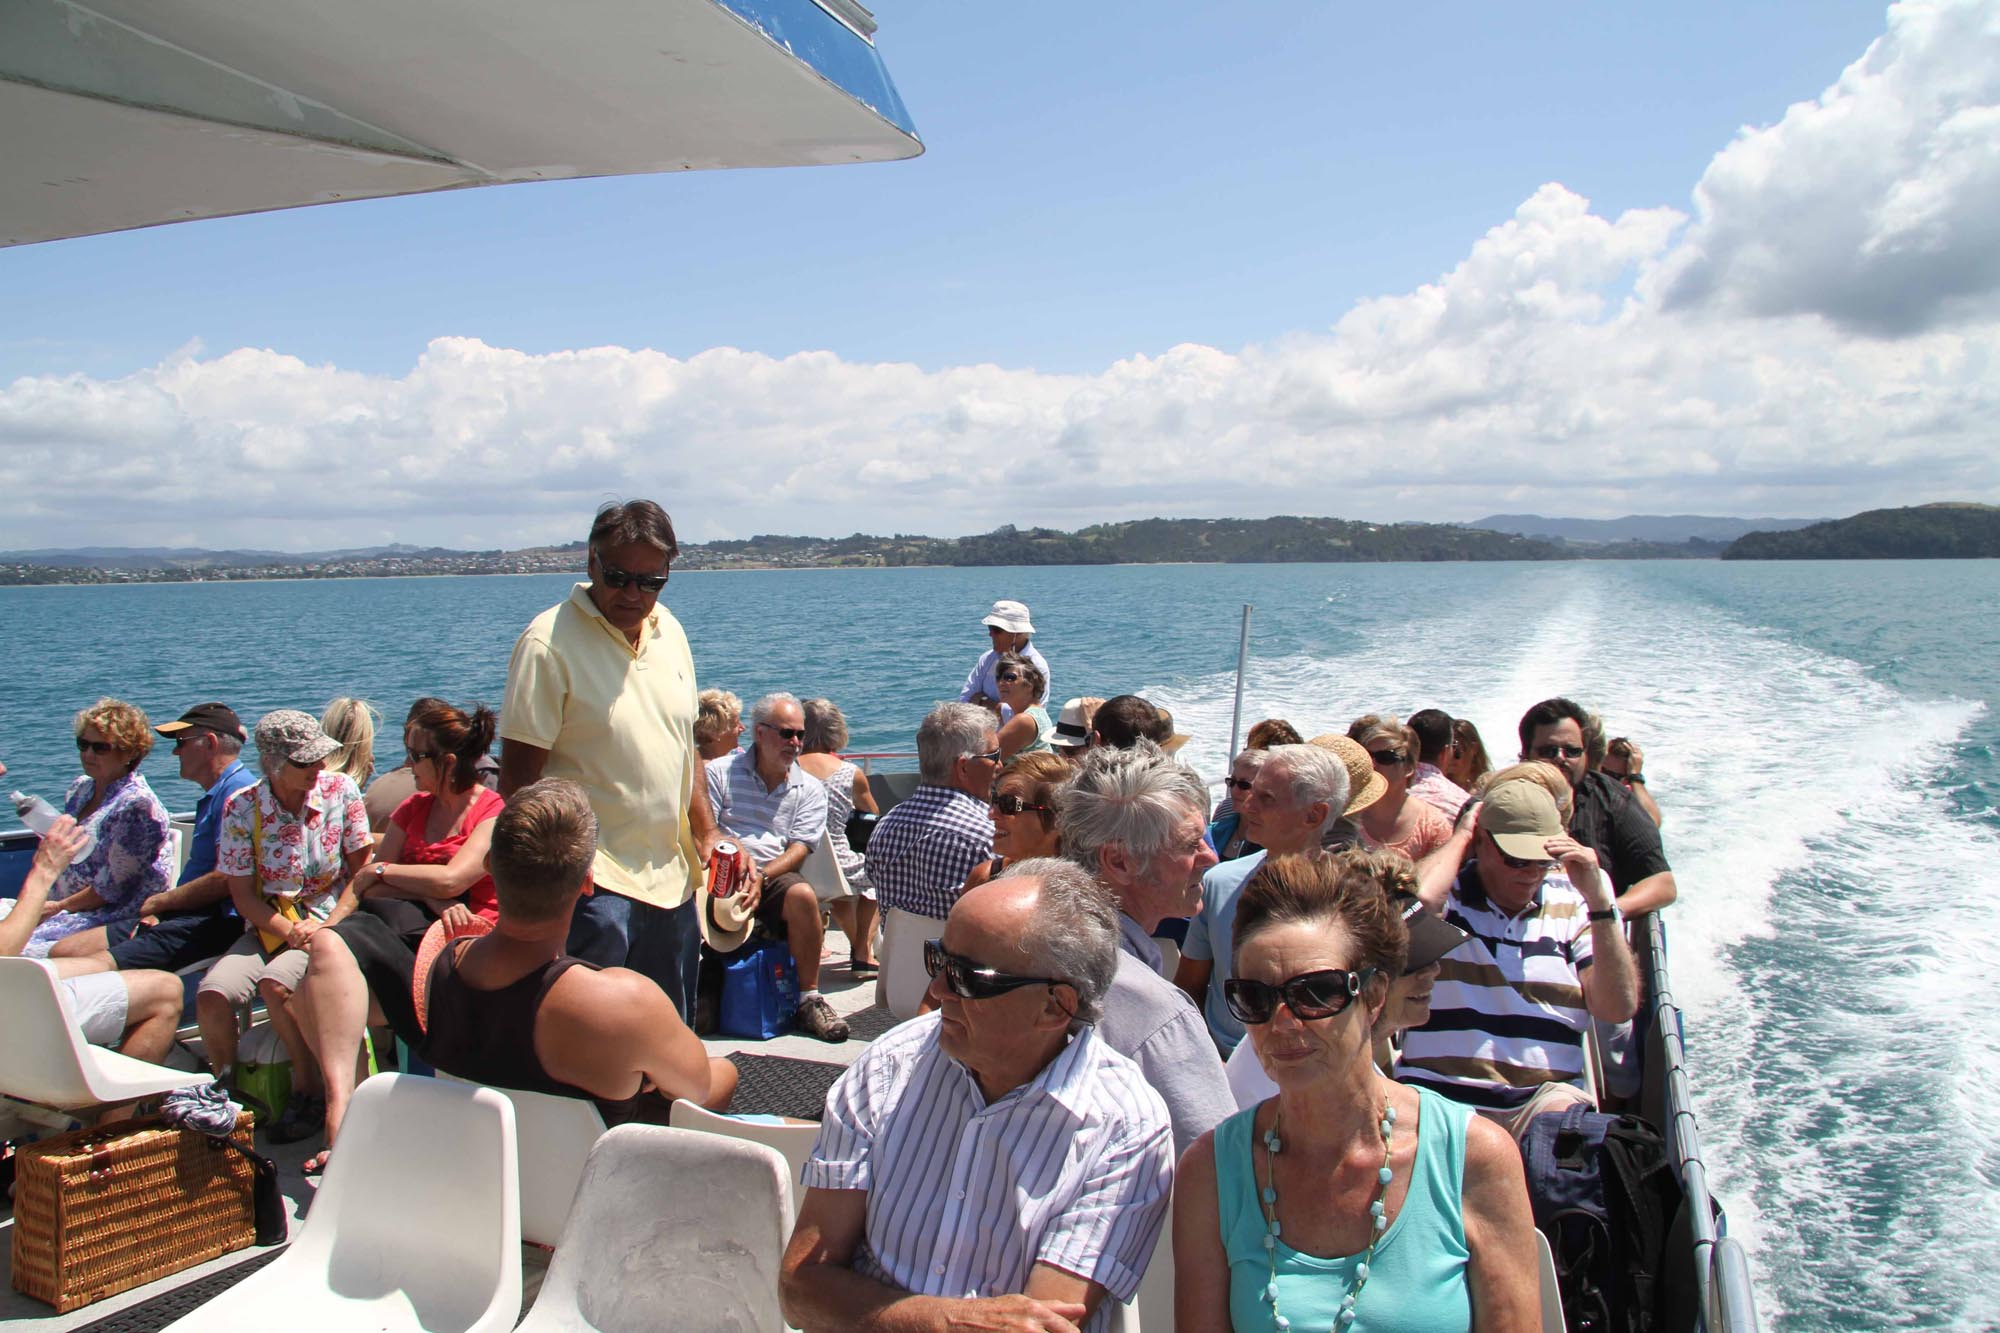 Ferry service to Kawau Island